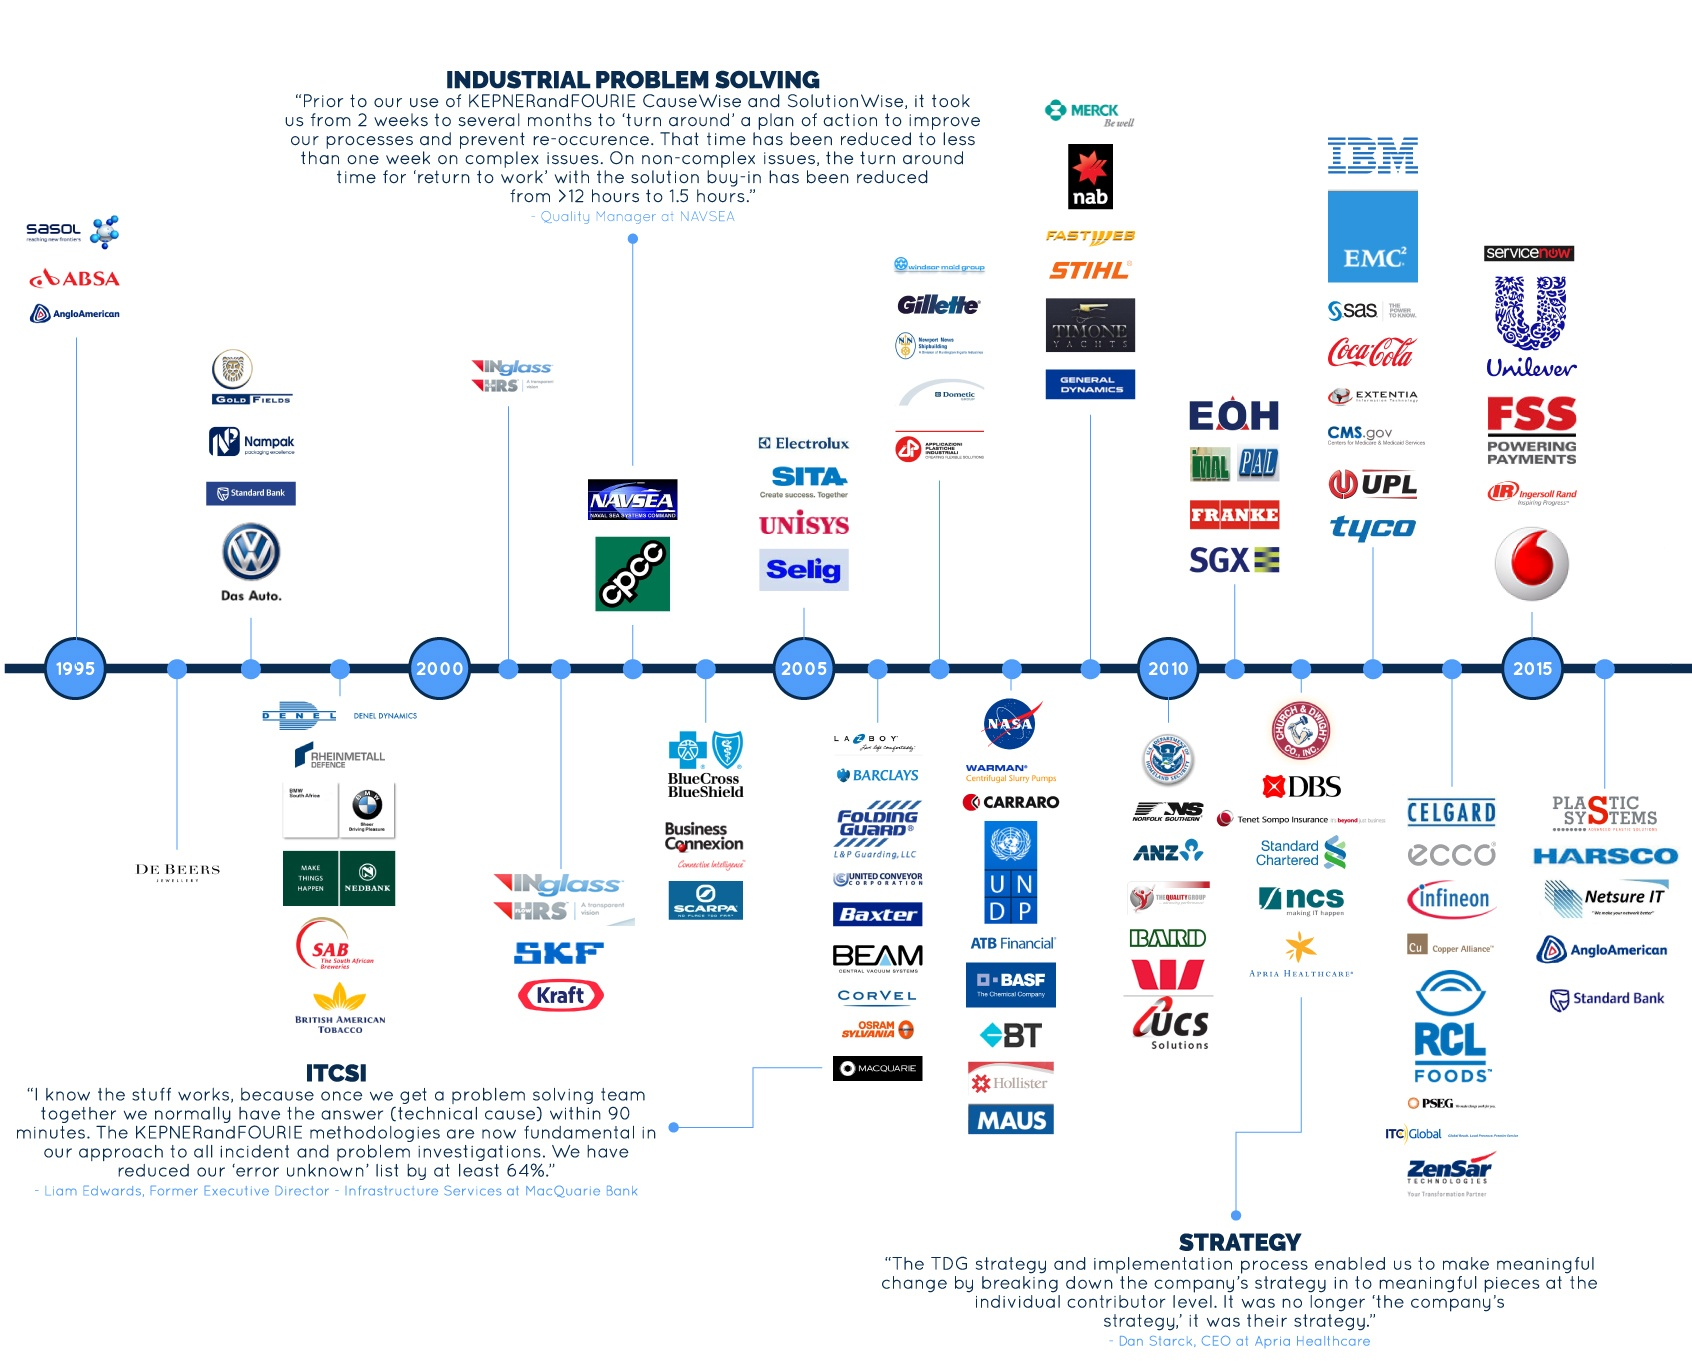 Timeline-2016-updated.jpg